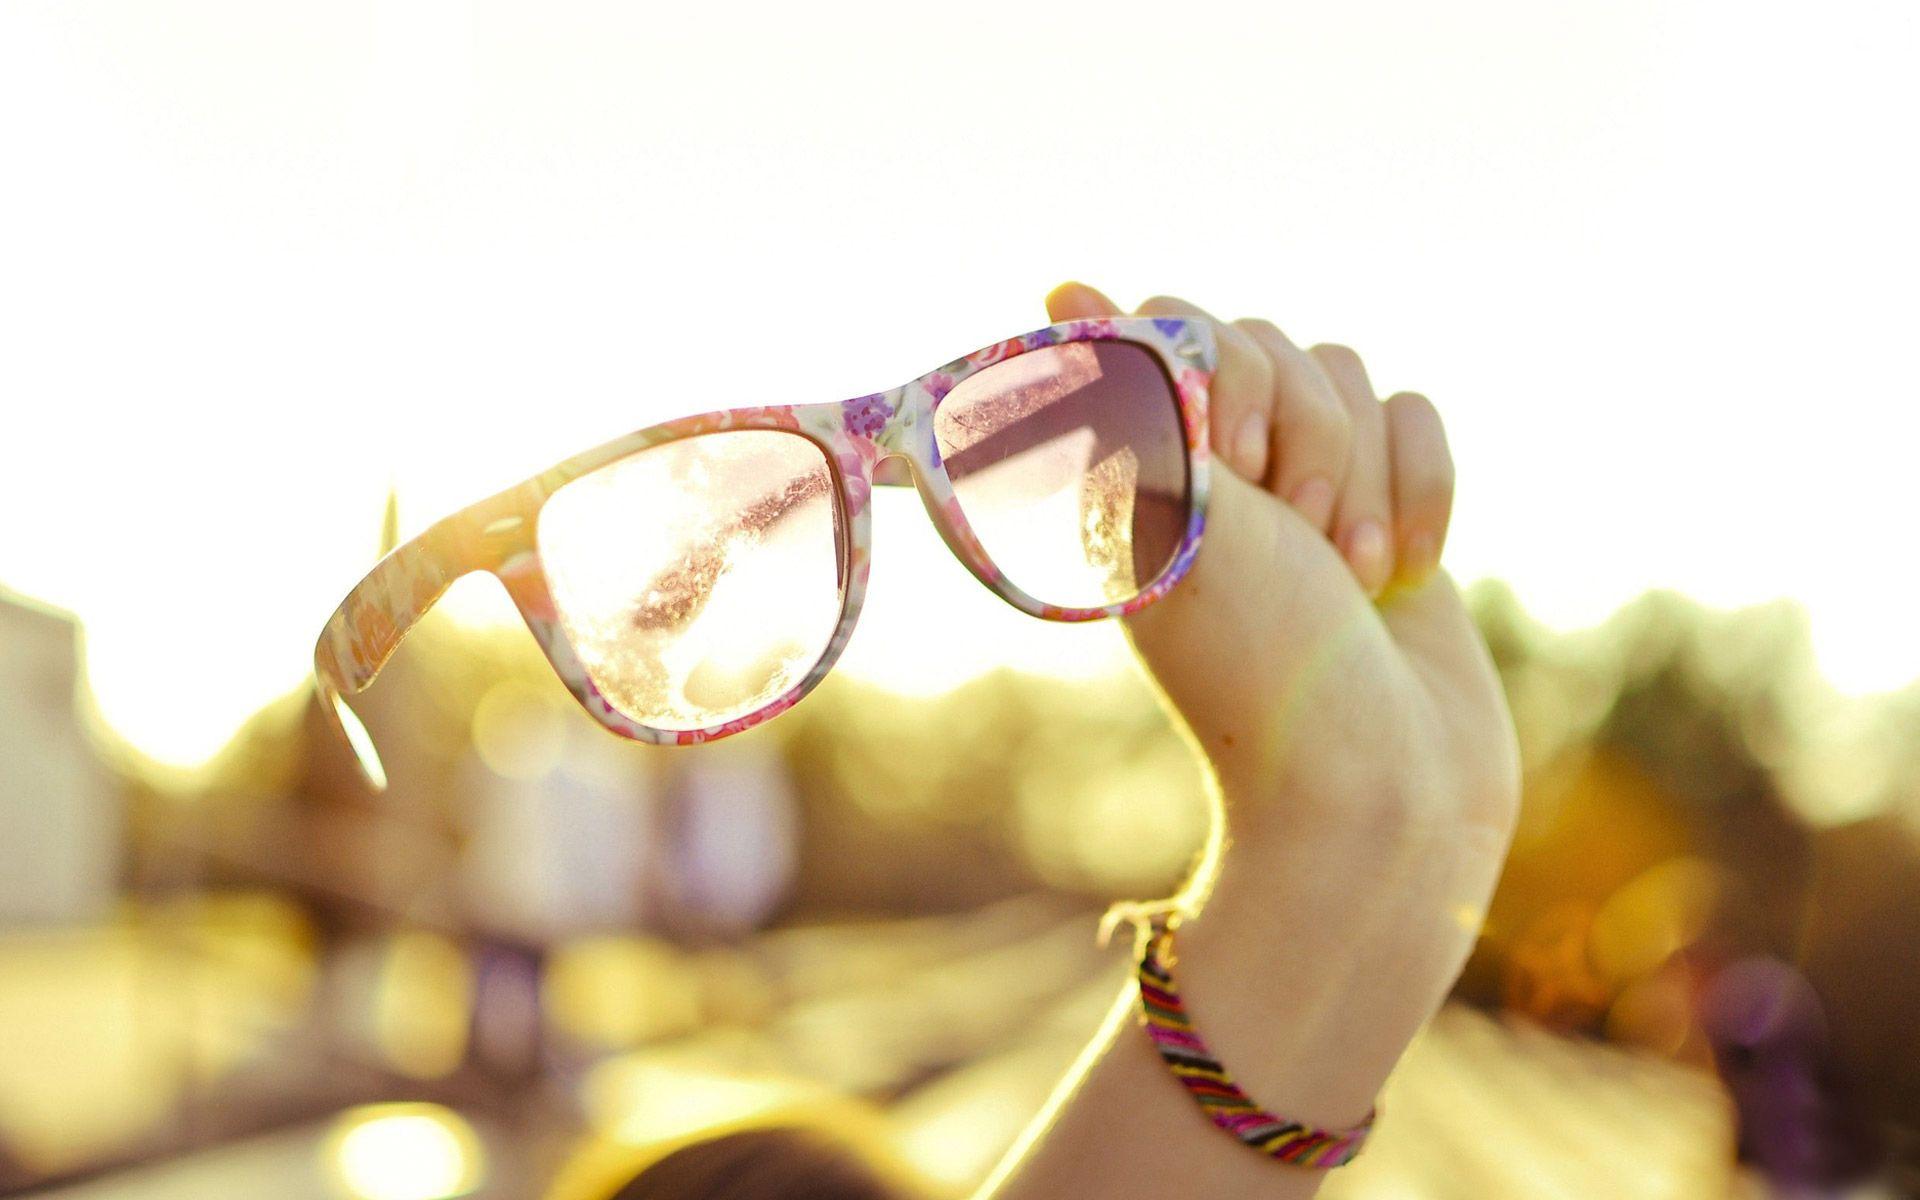 sunglasses hd wallpaper amazing life style hd wallpapers